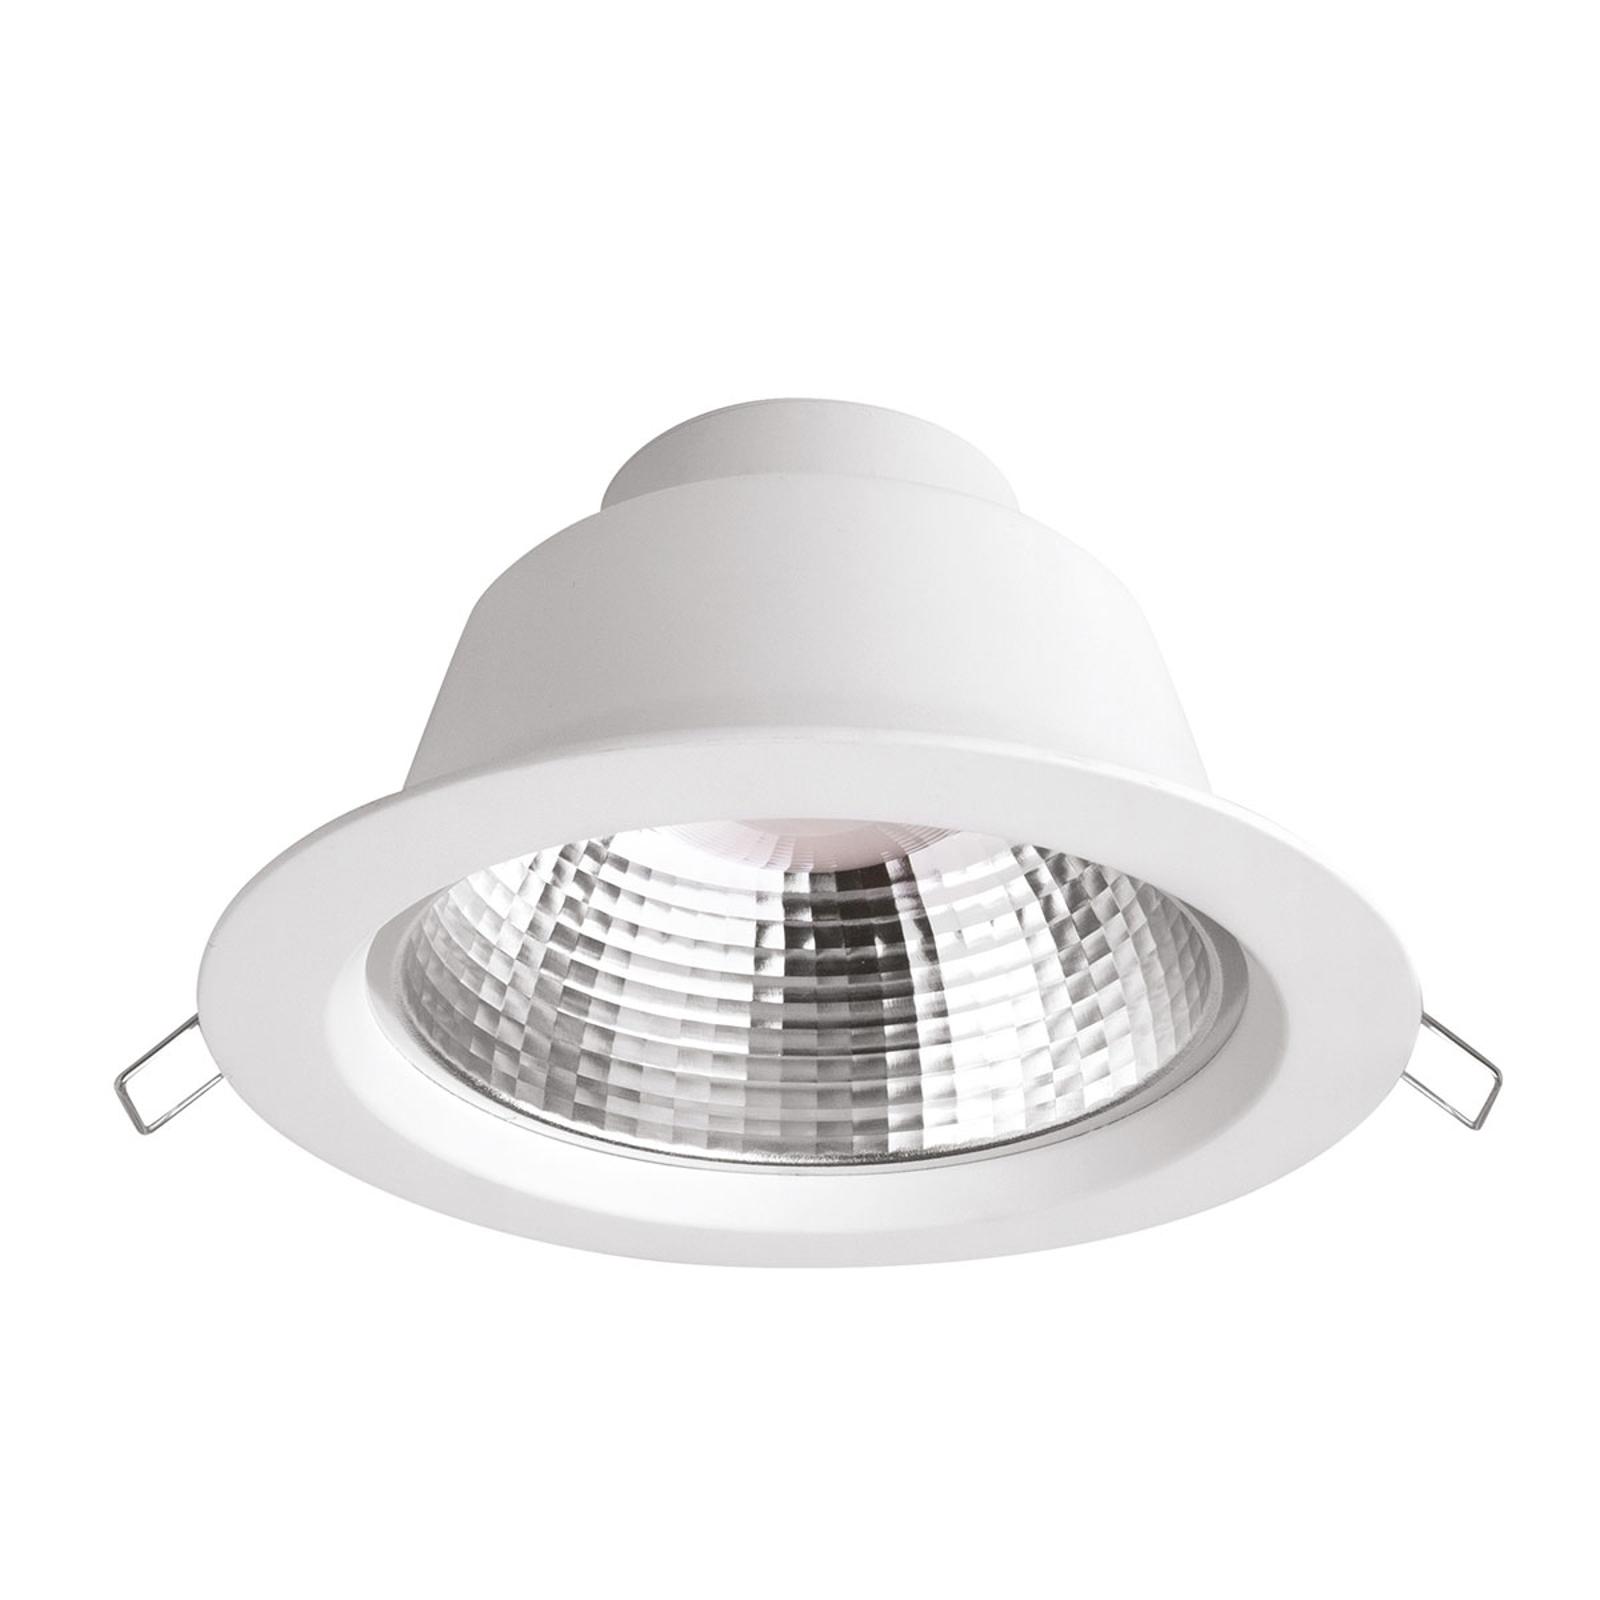 LED-Einbauleuchte Siena, 9,5 W, 2.800 K